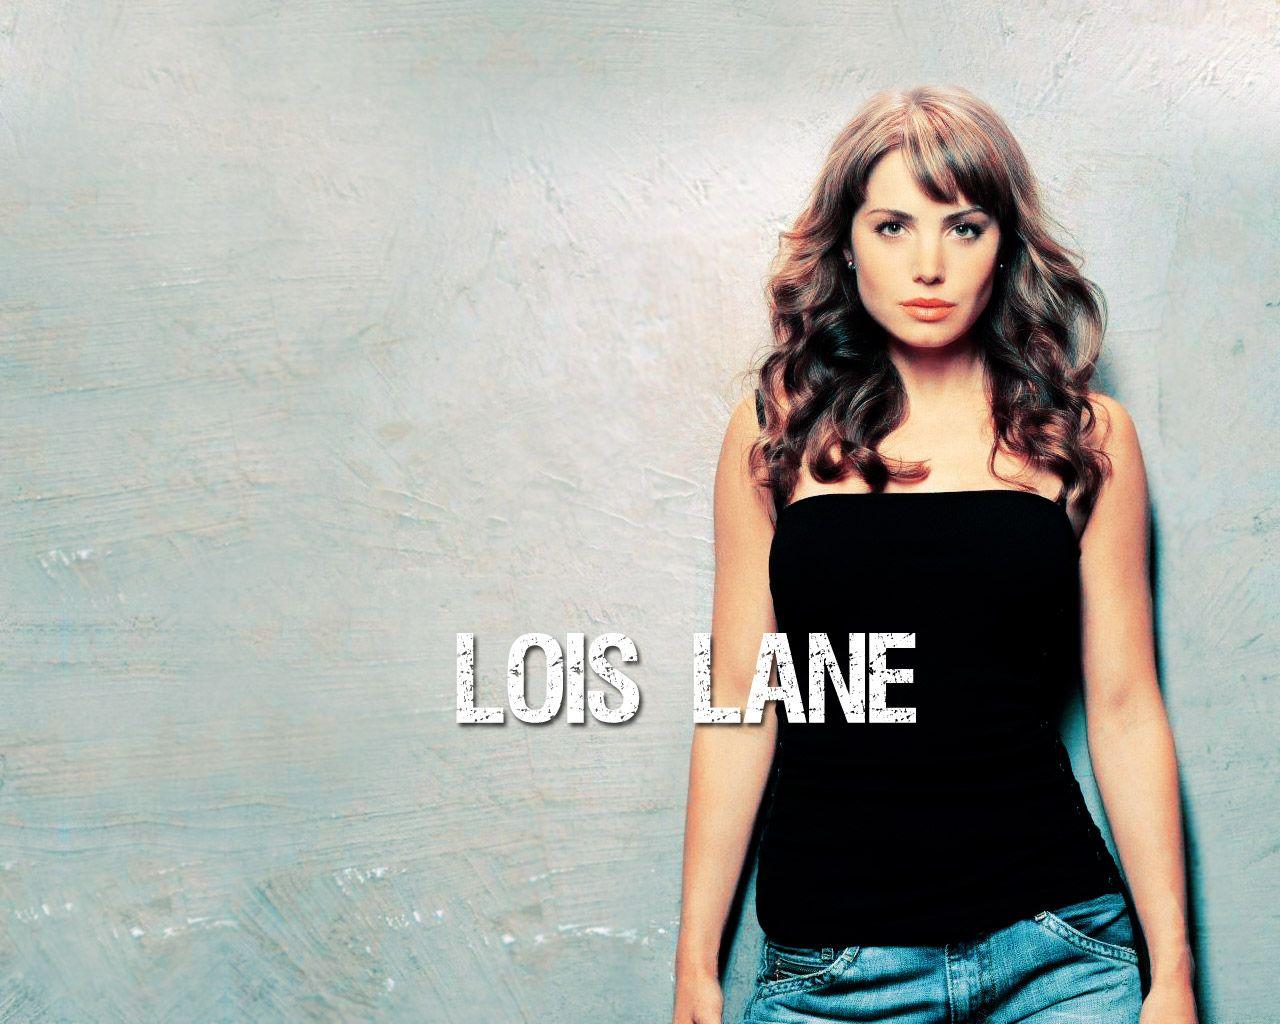 Lois Lane Black Top Portrait Wallpaper 1280x1024